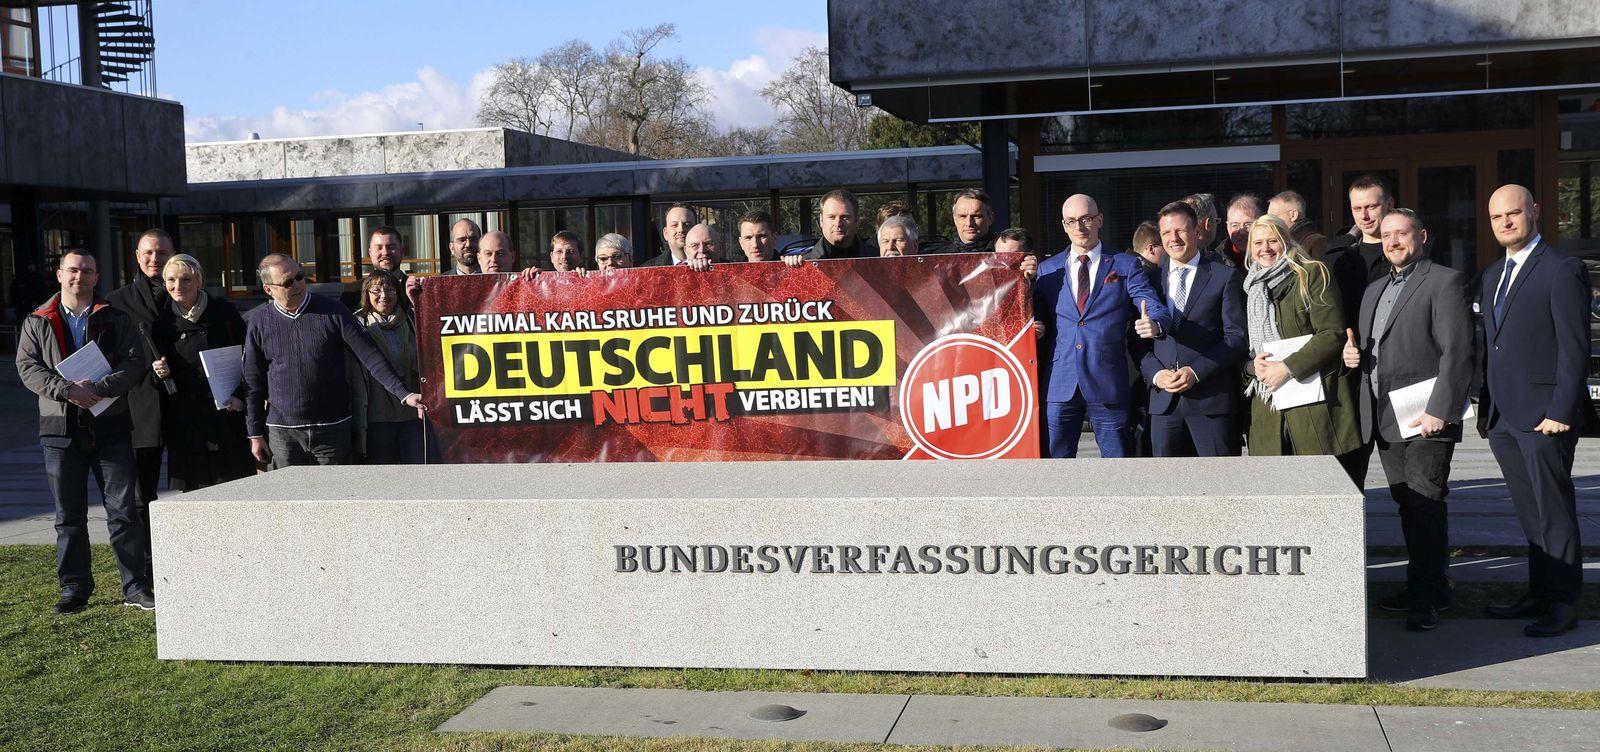 NPD/ Karlsruhe